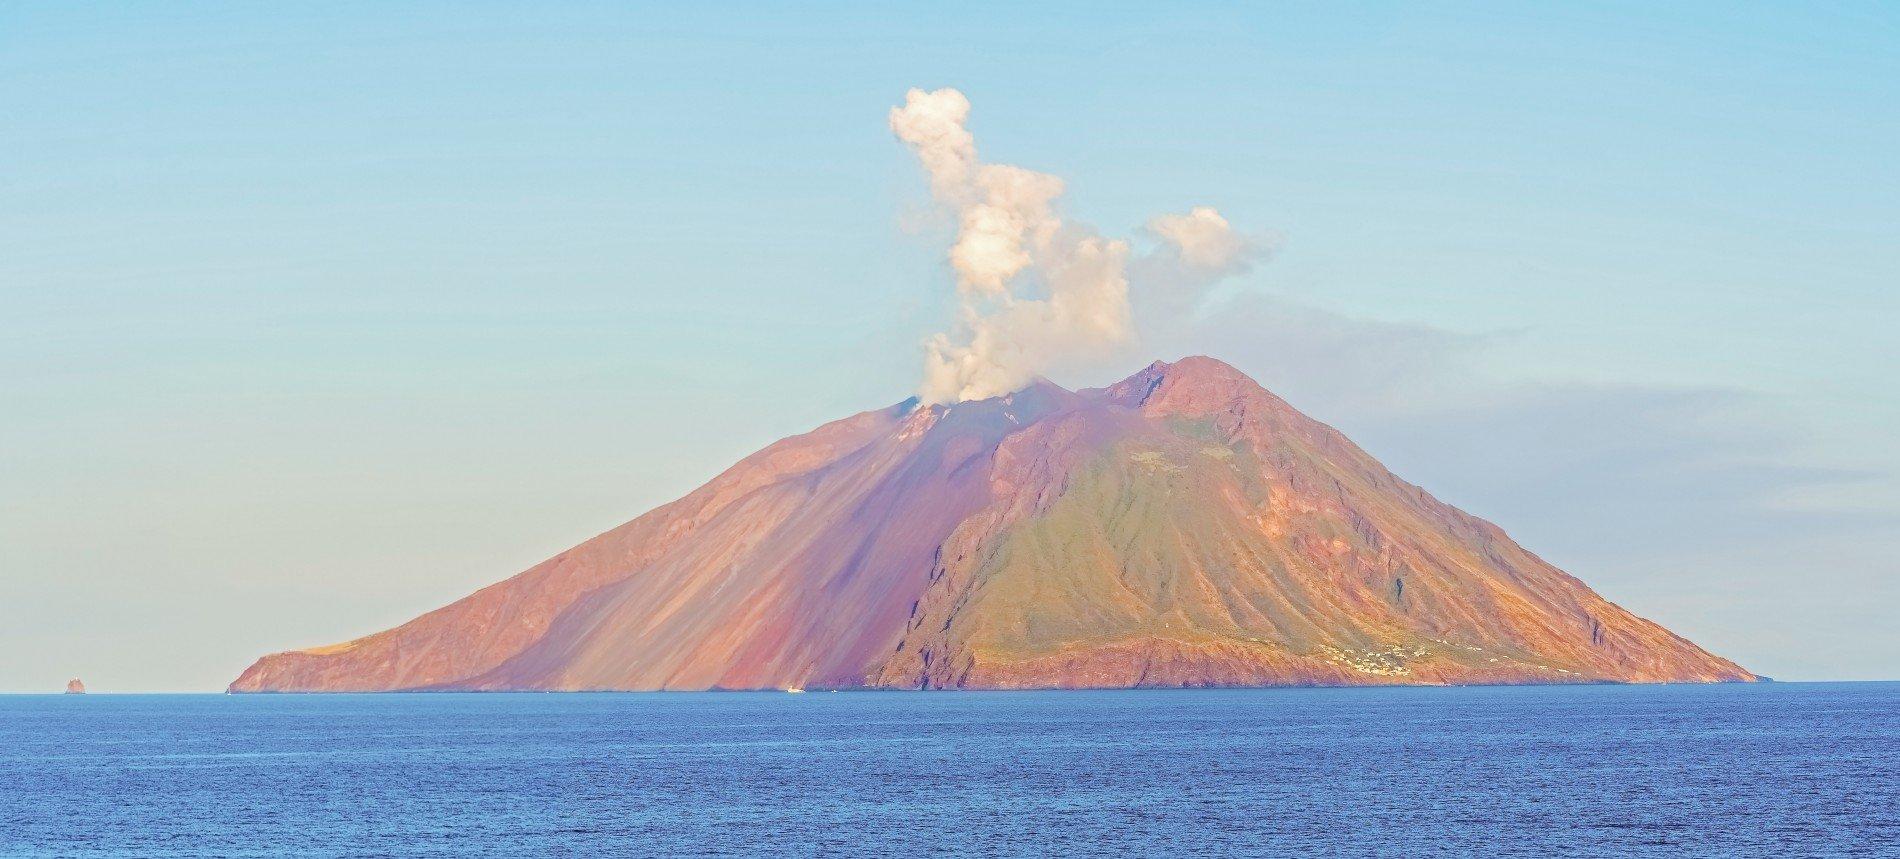 filicudi-yacht-charter-stromboli-itinerary-aeolian-islands